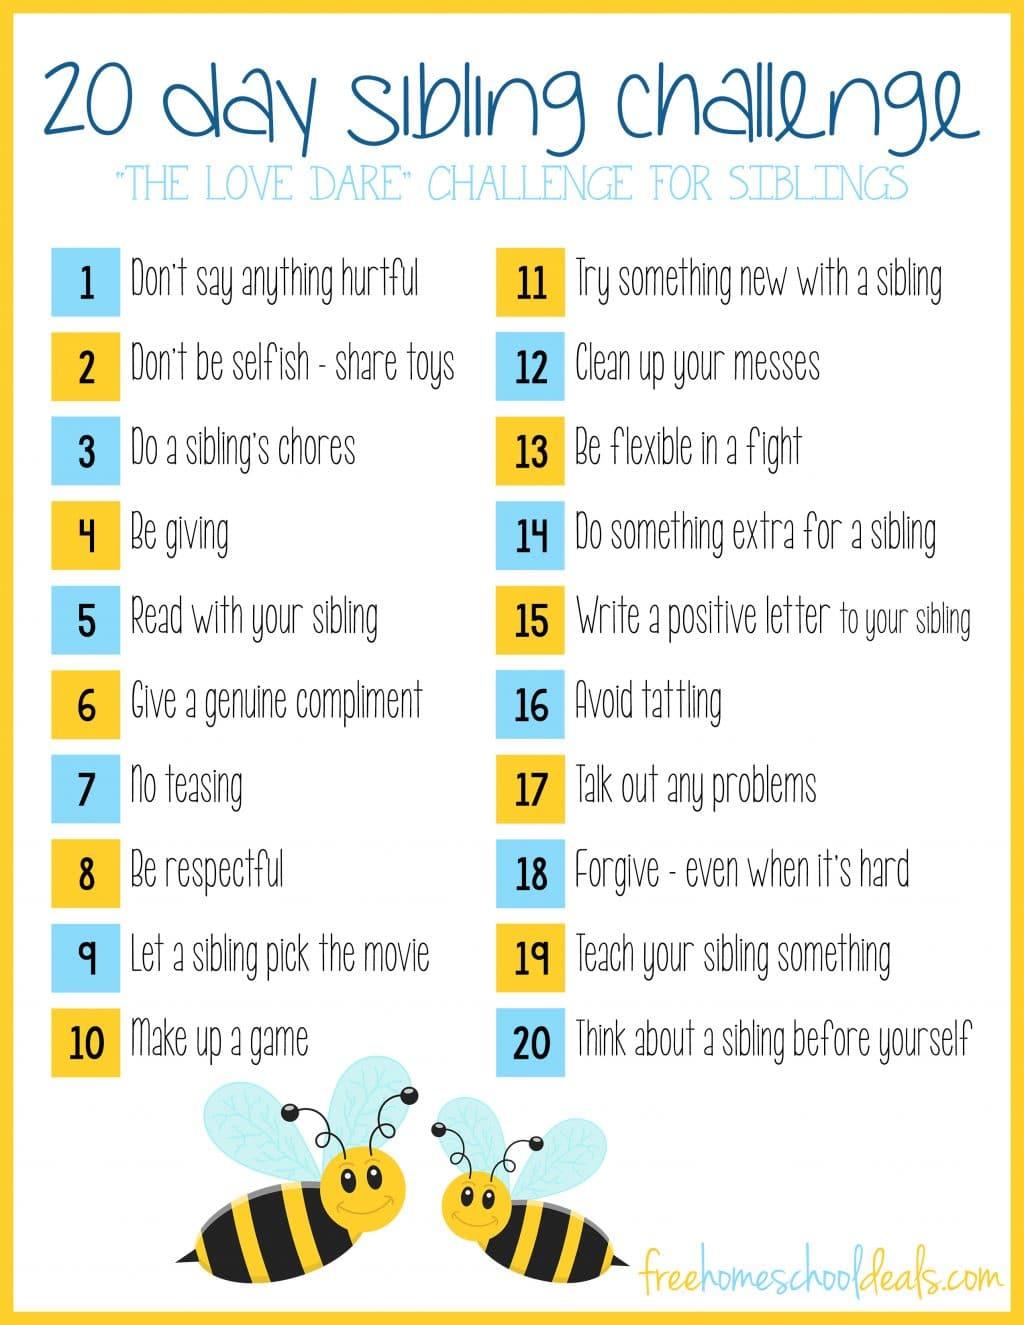 Free Printable 20 Day Sibling Challenge